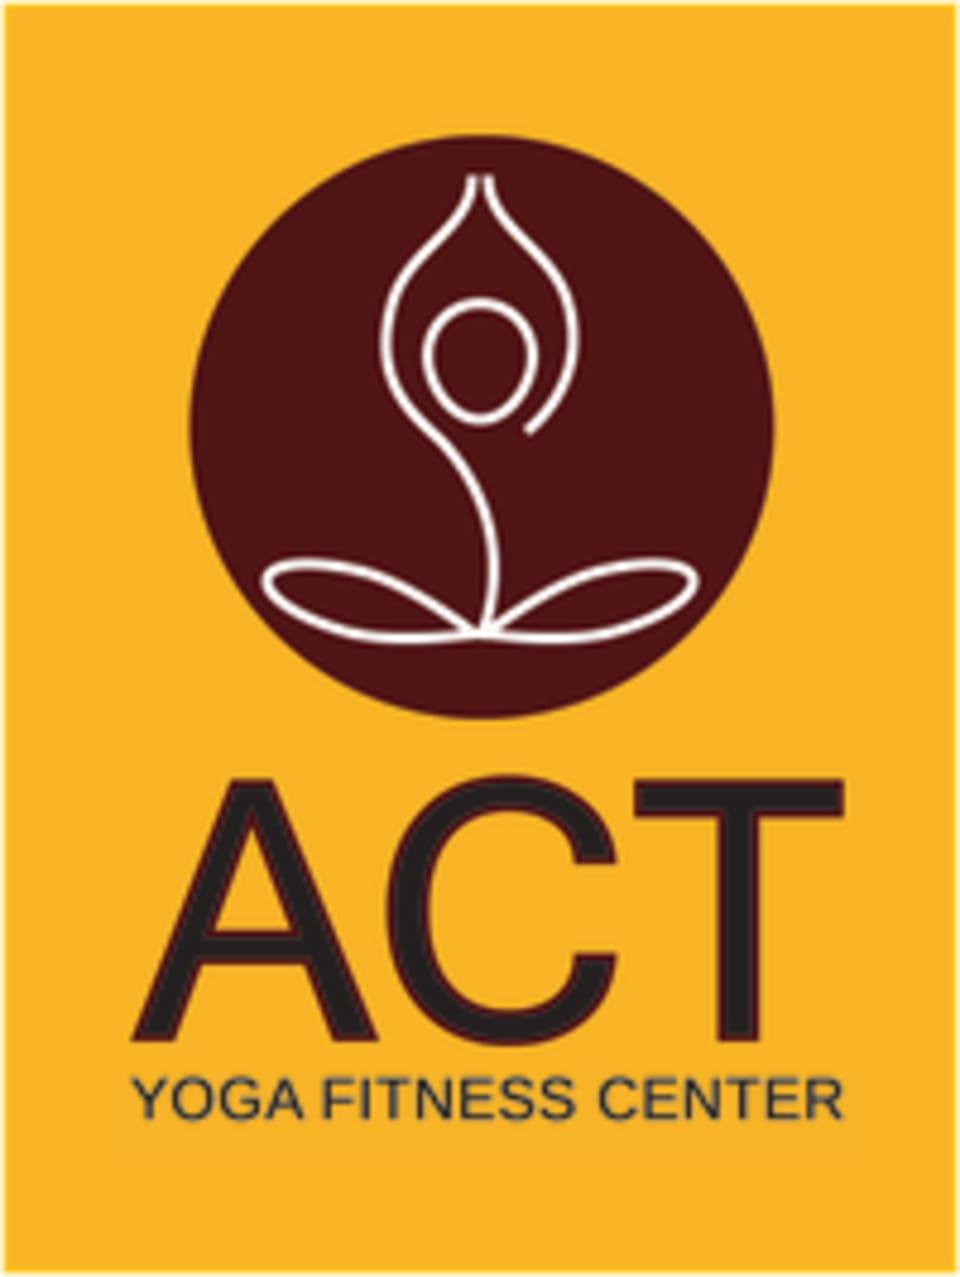 ACT Yoga Fitness Center logo